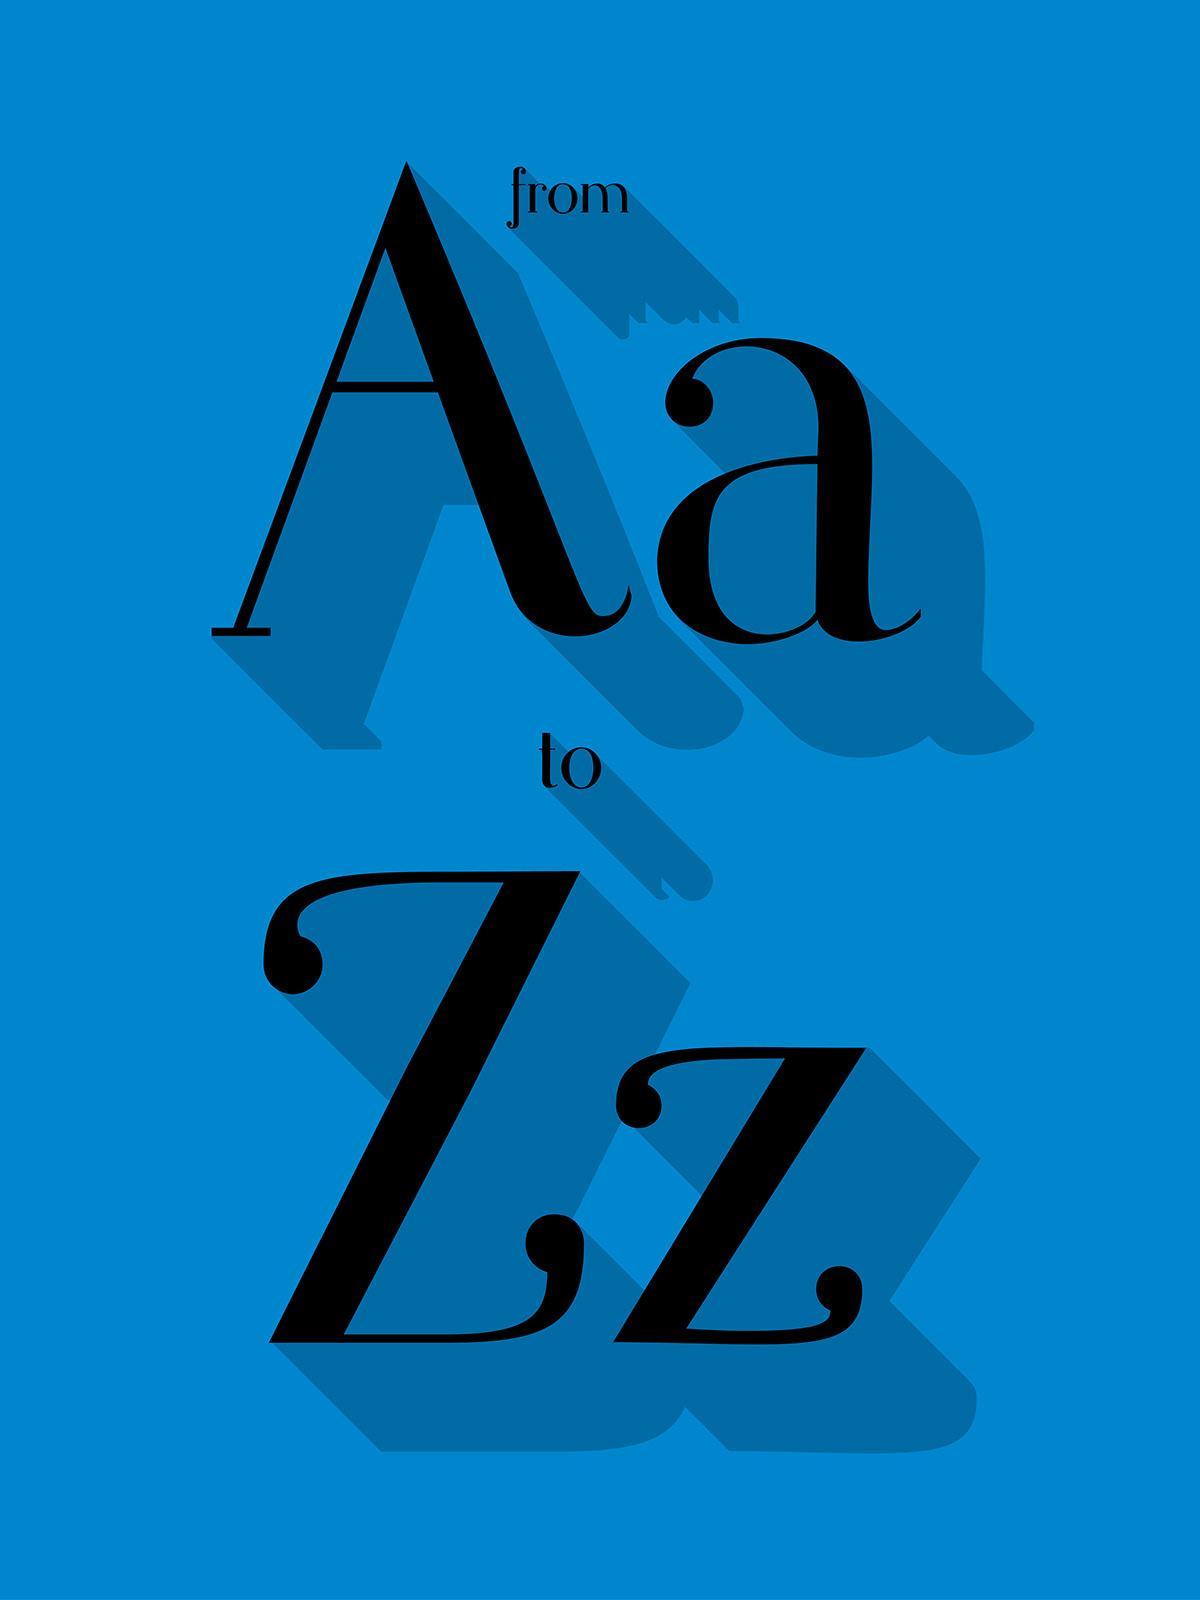 Typeface font schriftart schrift drop short project Martina Flor Own Typeface Myfontproject my font free download free download downlaod